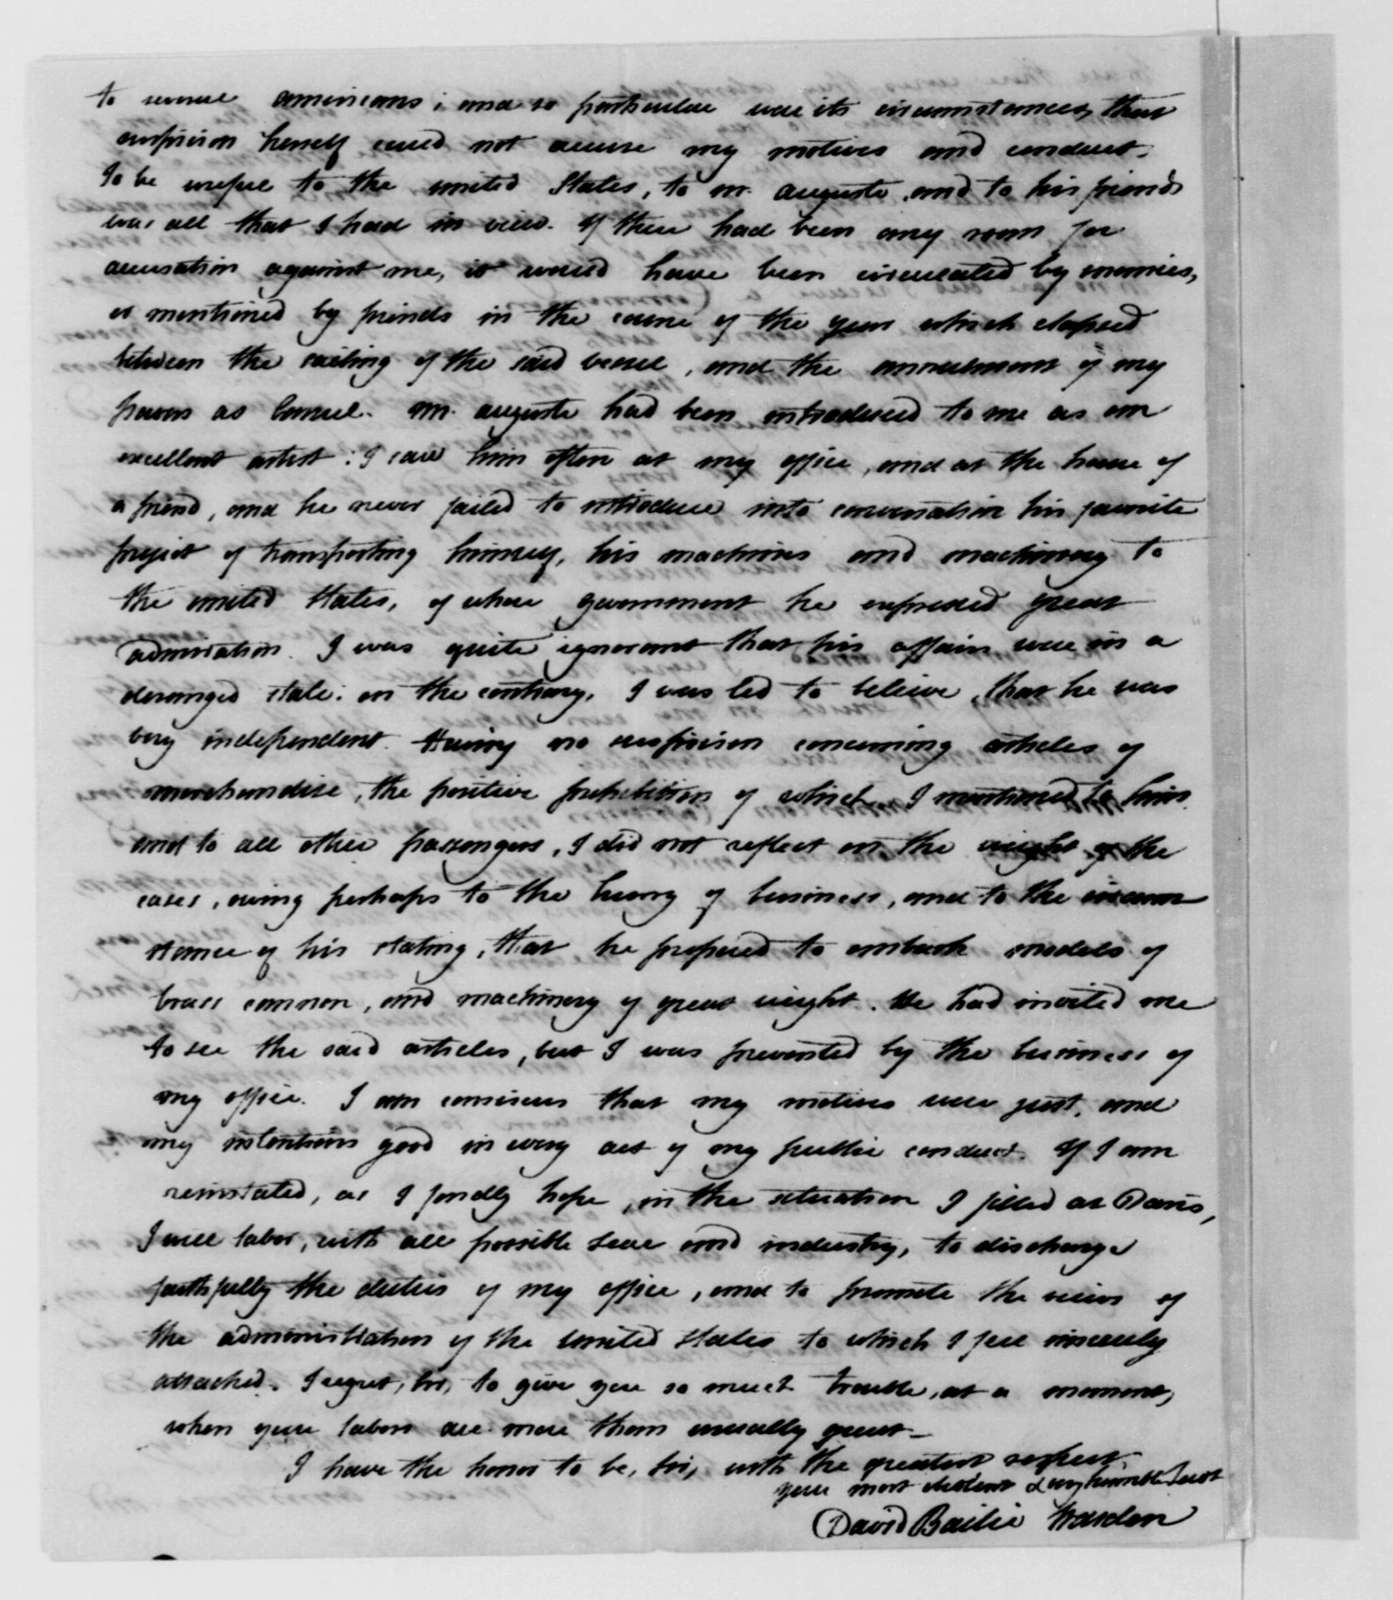 David Bailie Warden to James Madison, February 26, 1811.